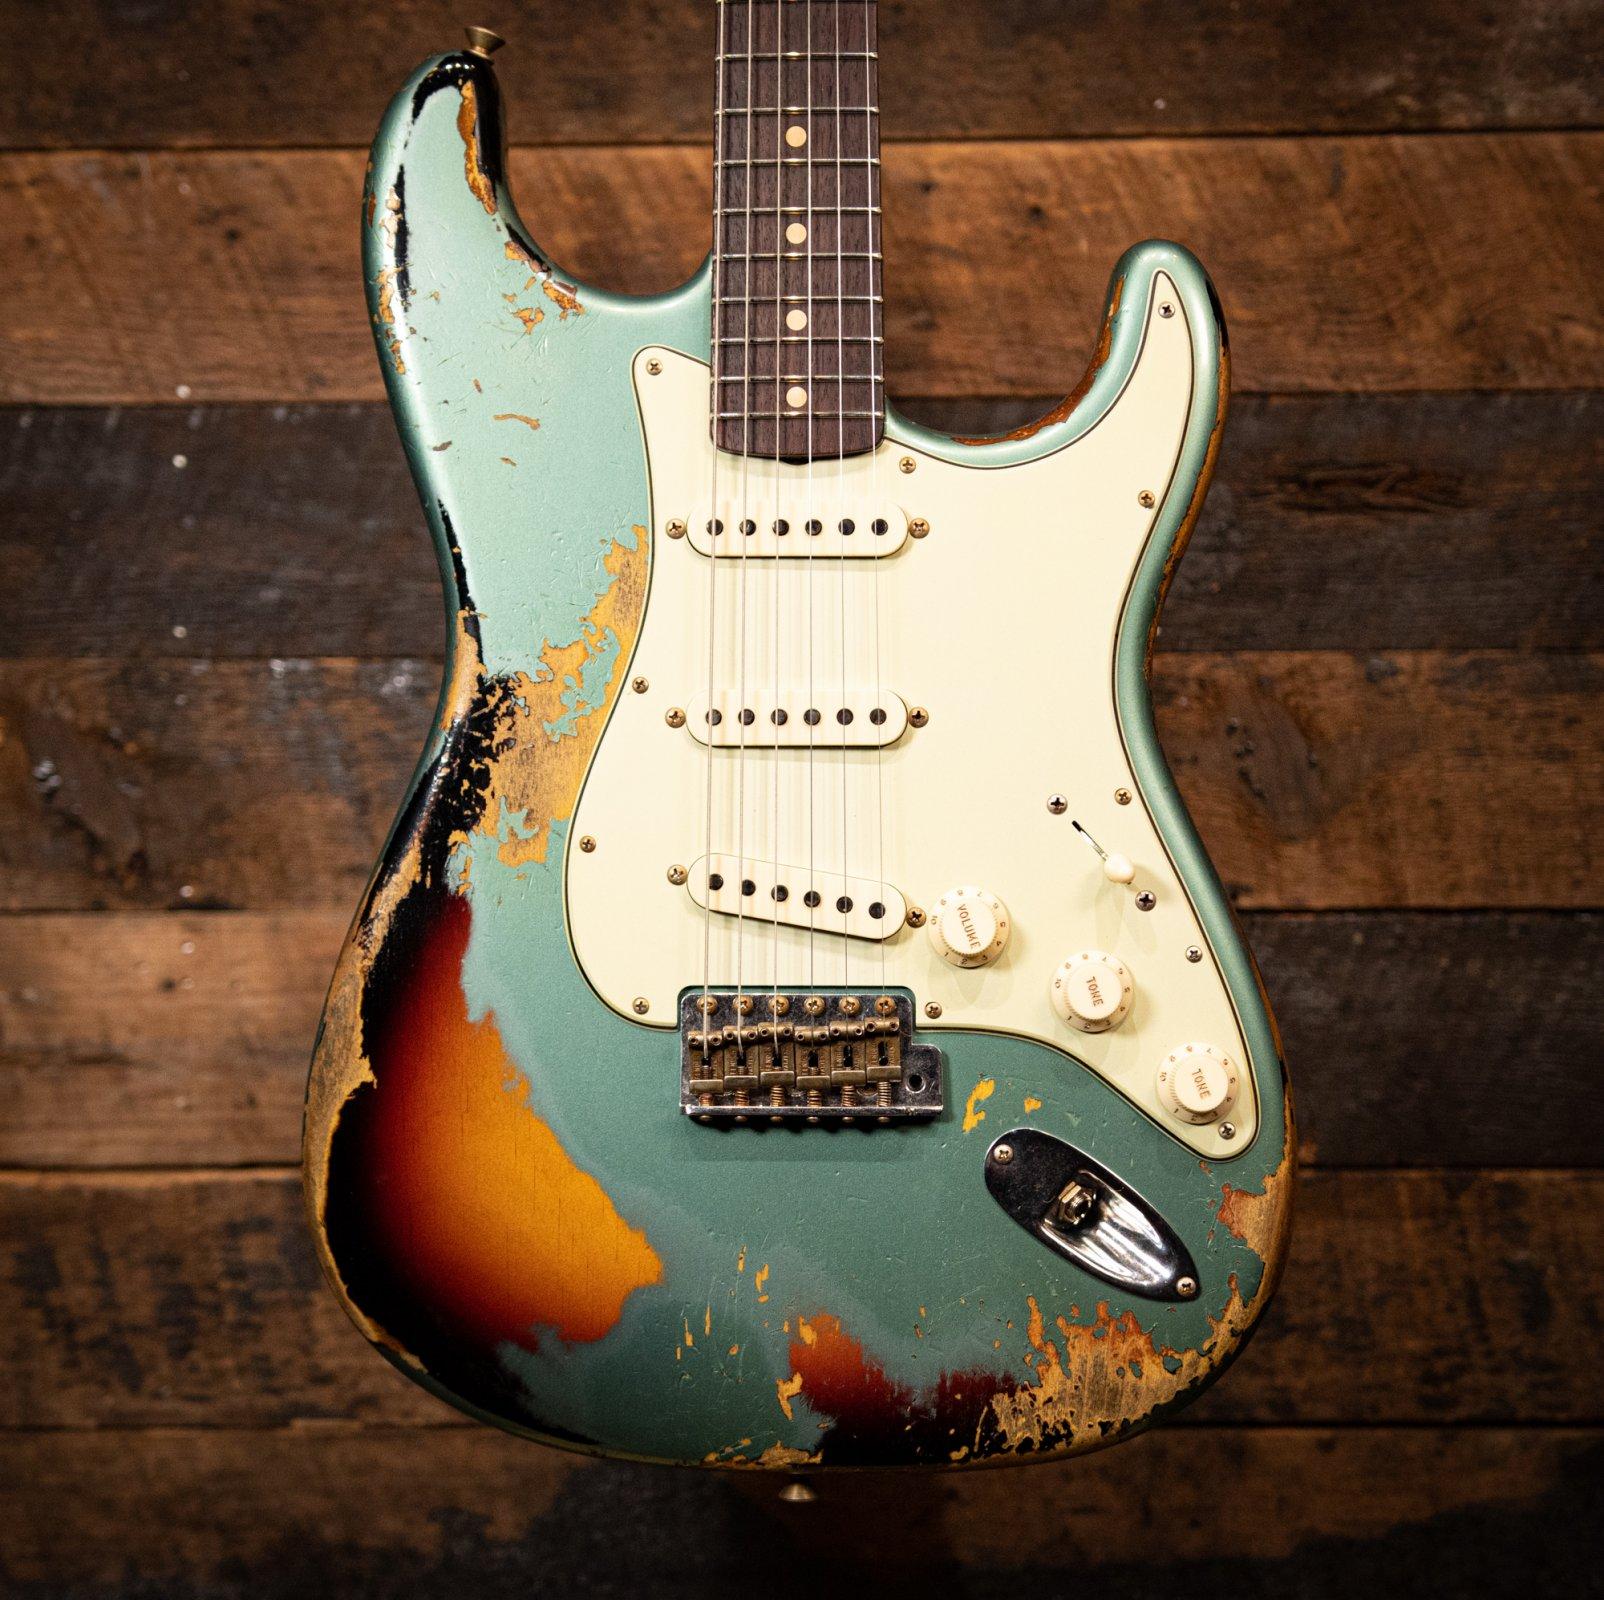 NAMM SHOW 1960/63 Fender Custom Shop Stratocaster Super Faded/Aged Sherwood Green over 3TSB